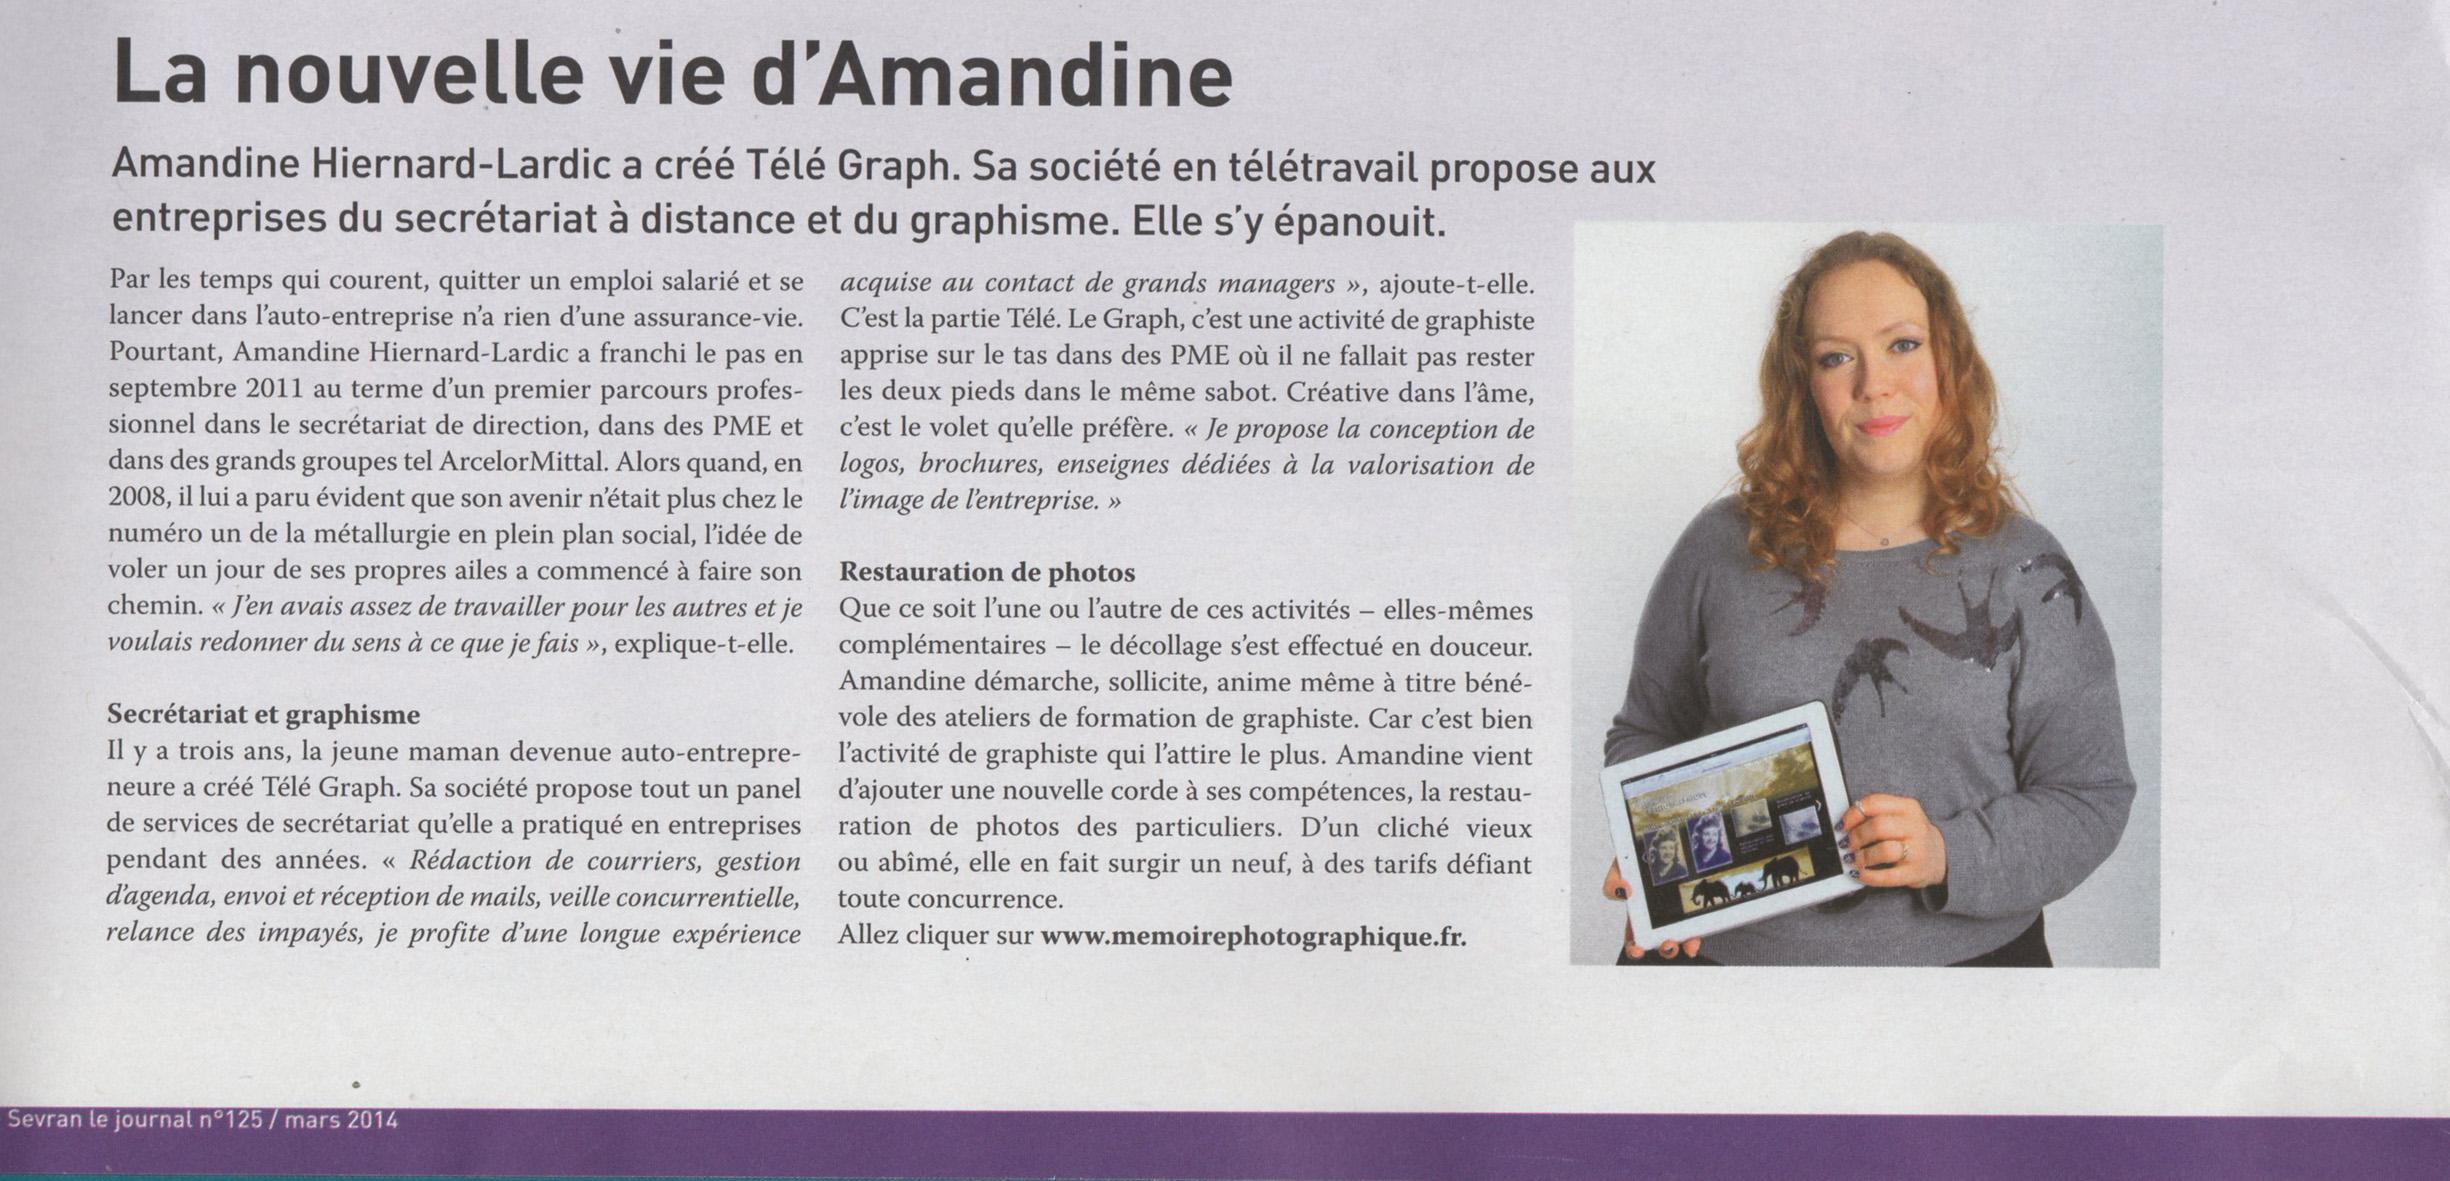 Article_journal_sevran_mars2014